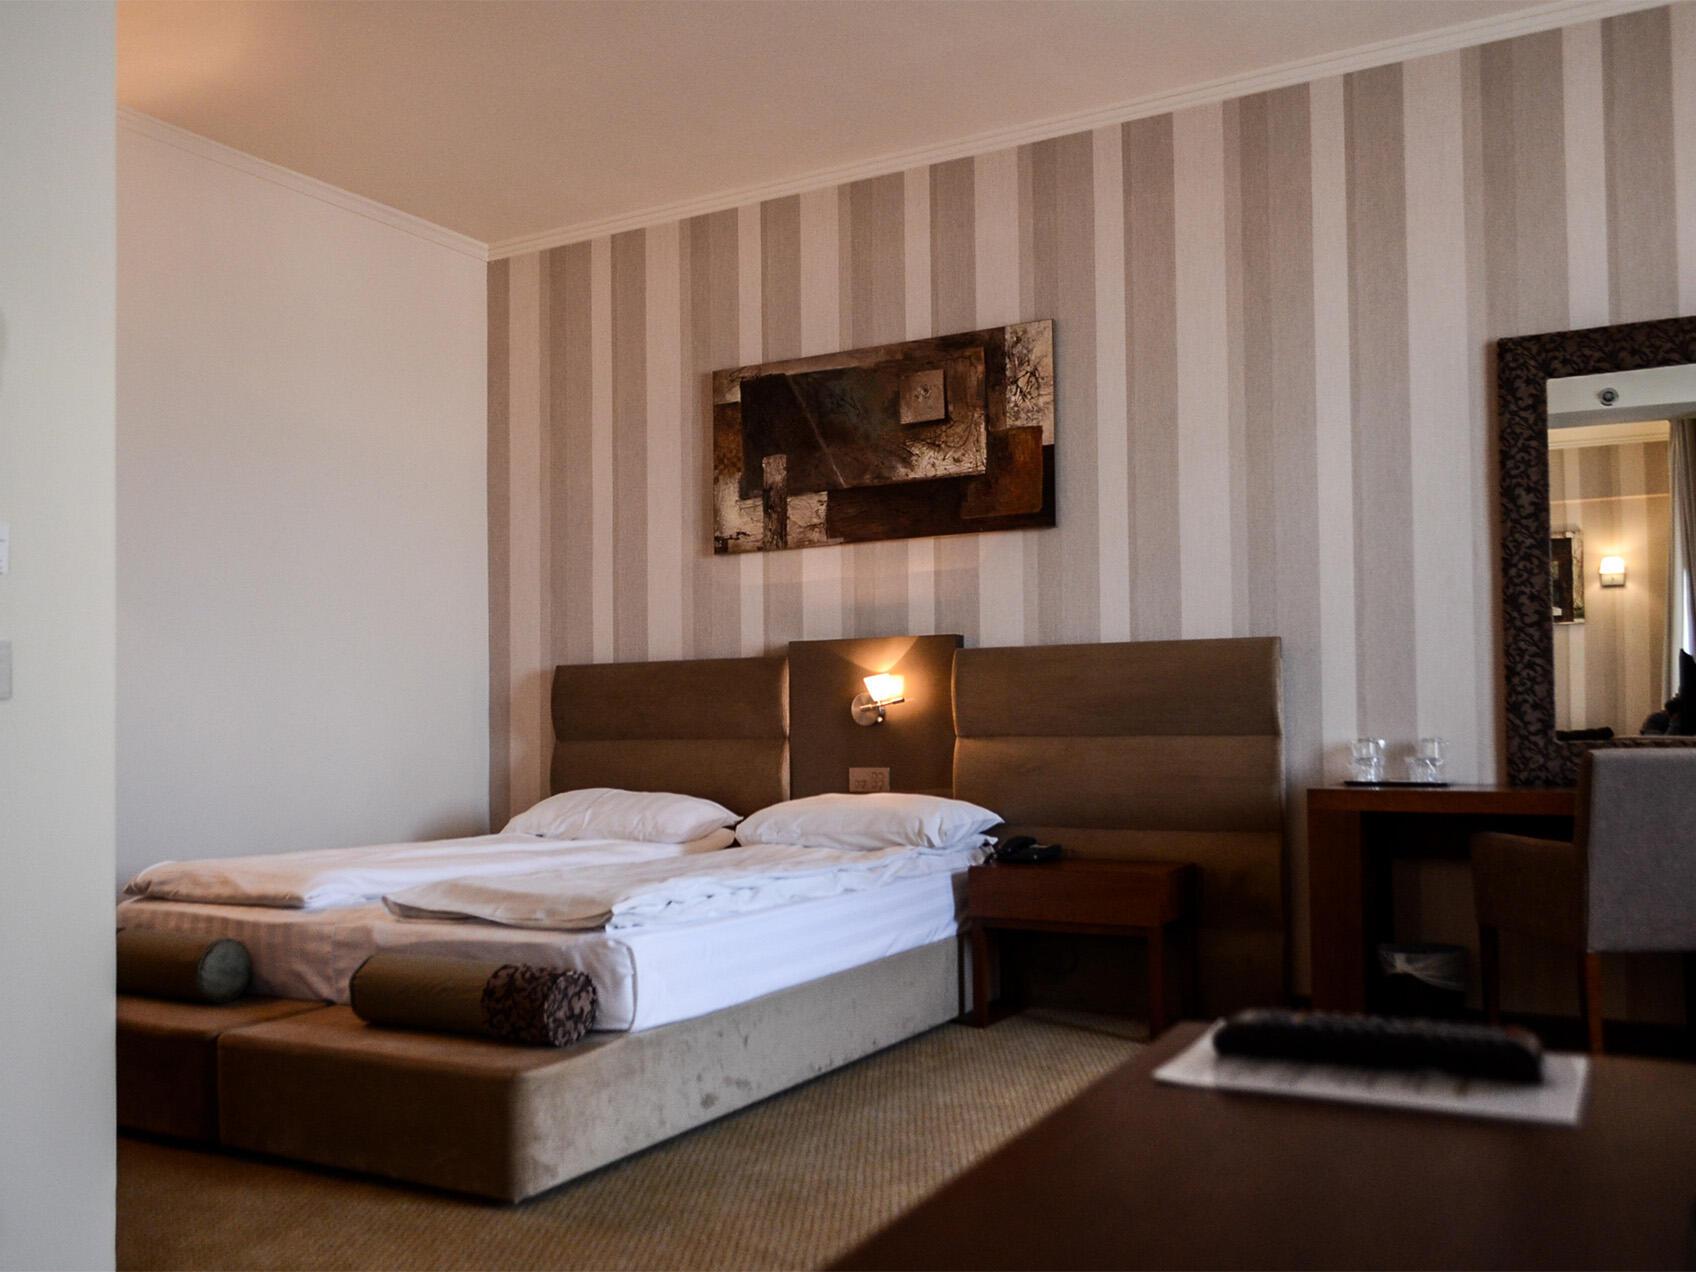 Seaview Superior Room at IAKI Conference & Spa Hotel in Mamaia